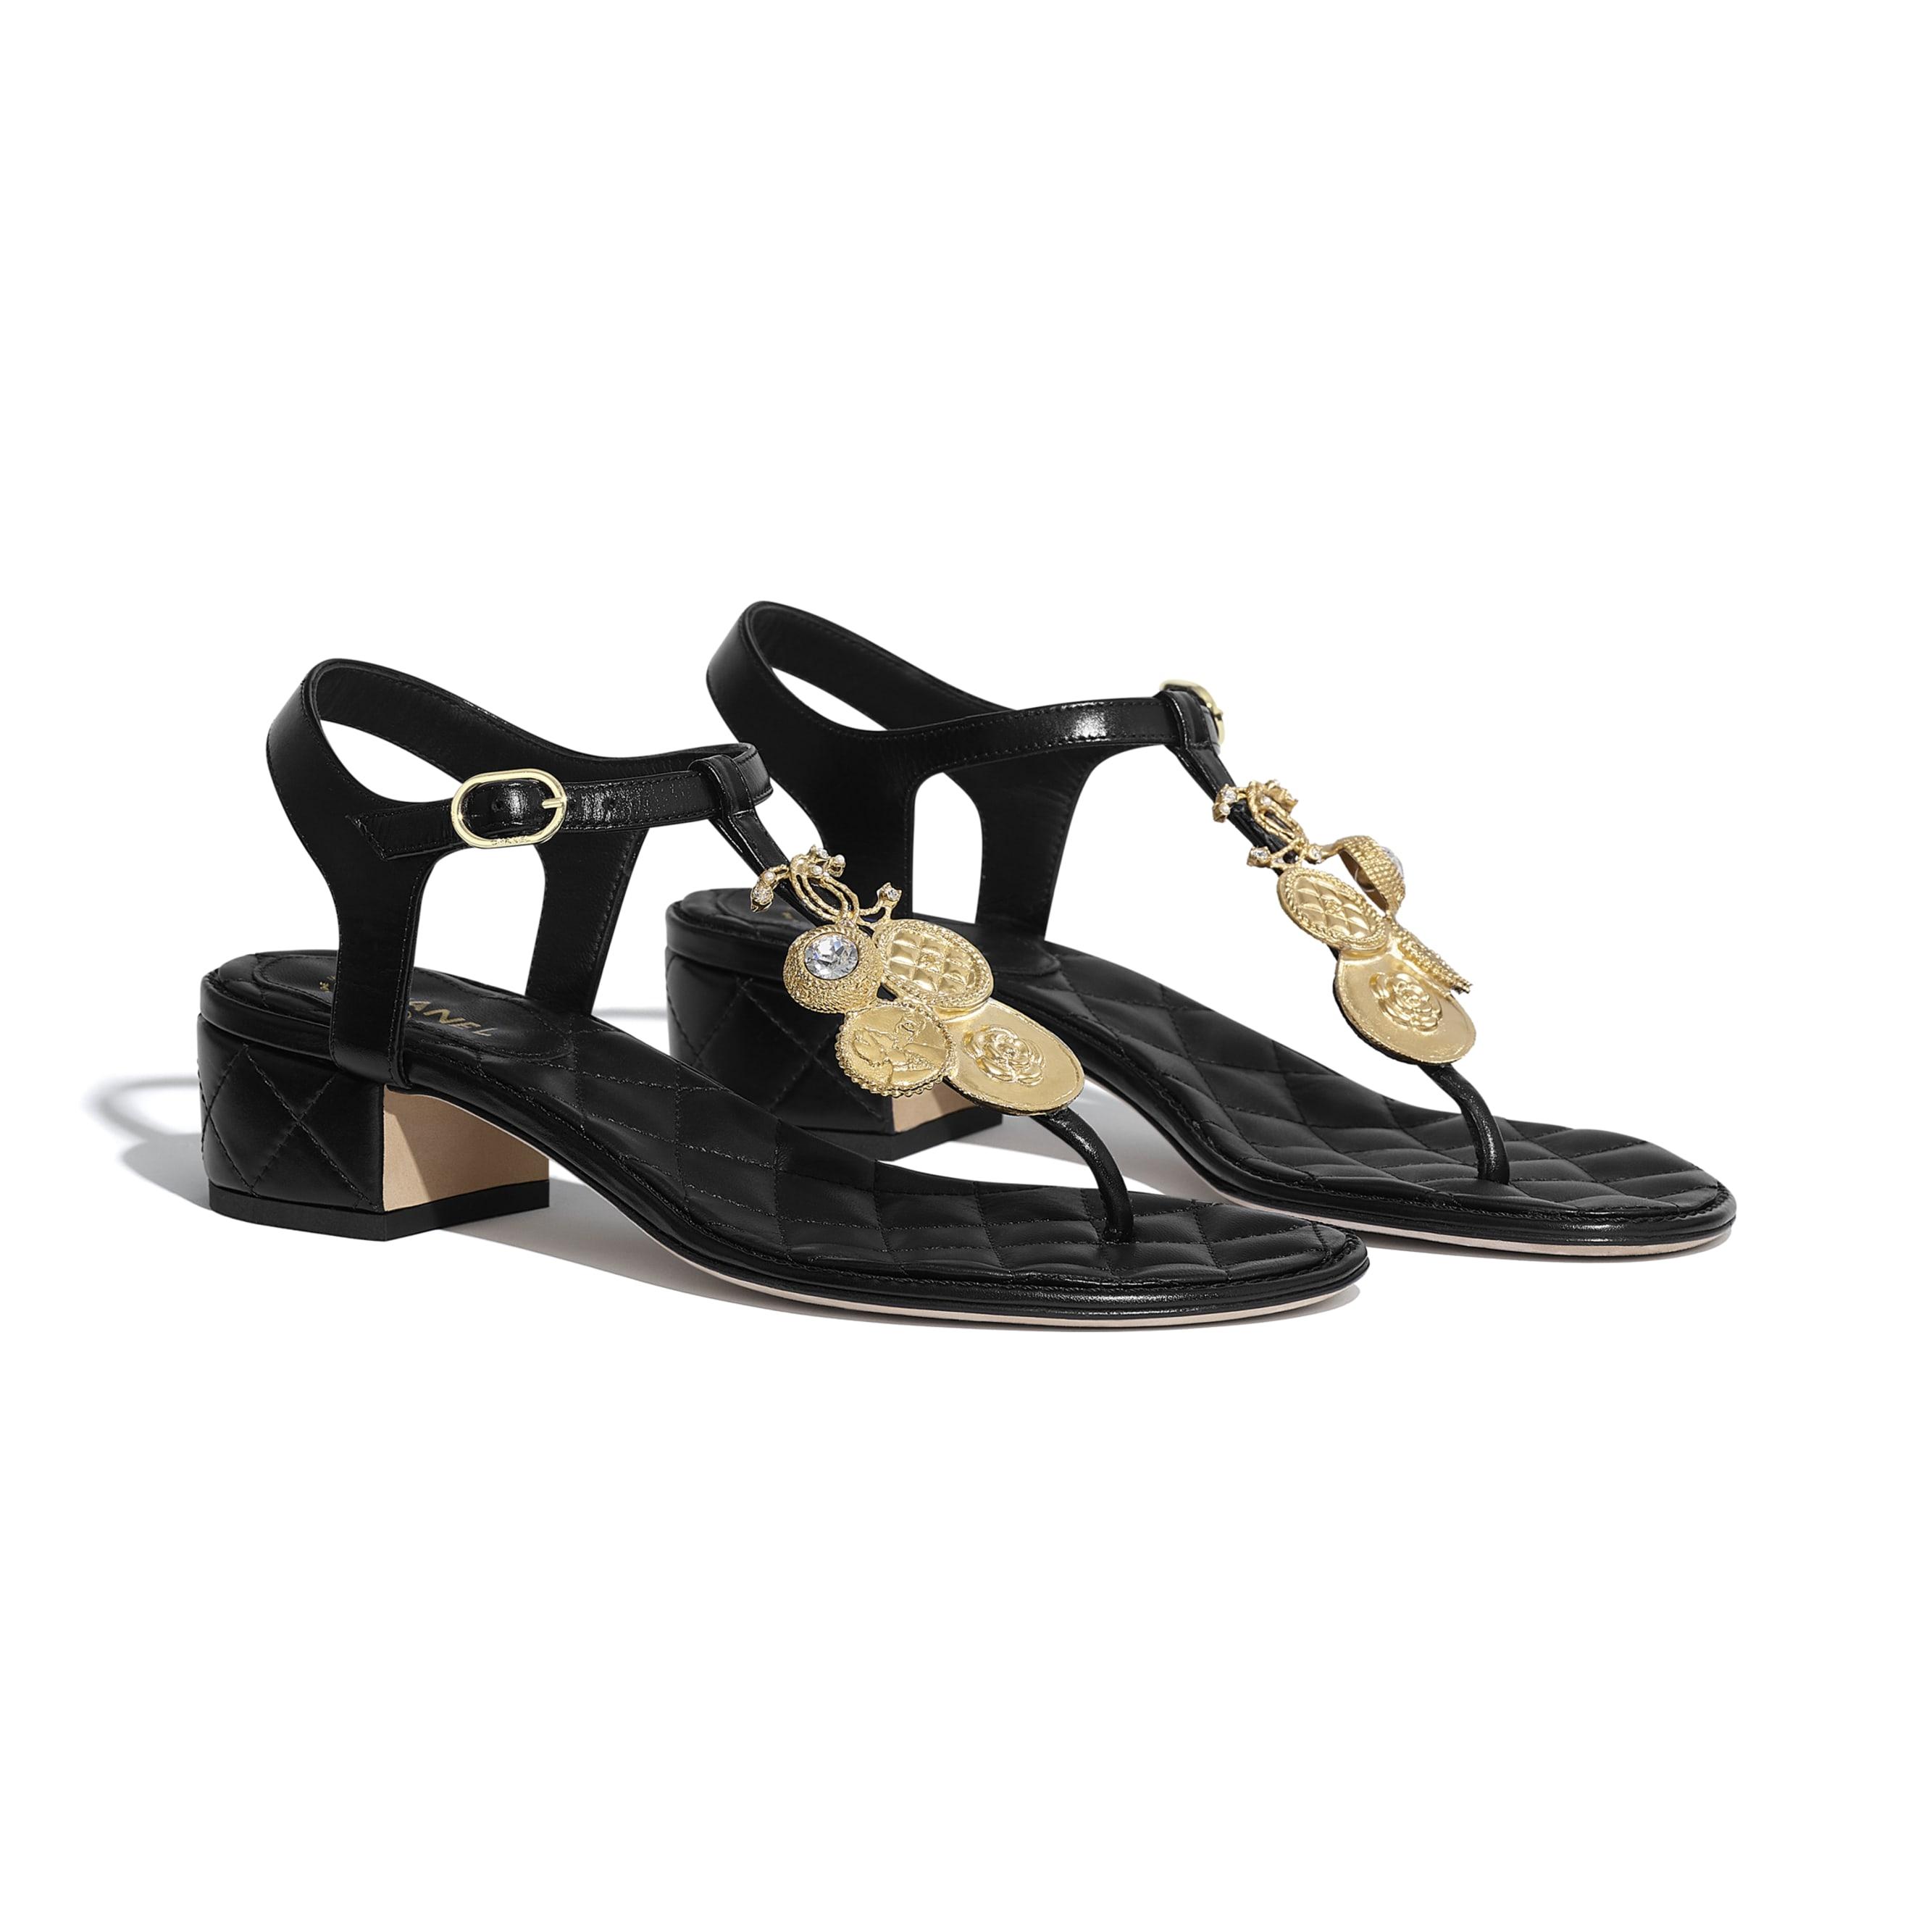 Sandals - Black - Calfskin - CHANEL - Alternative view - see standard sized version